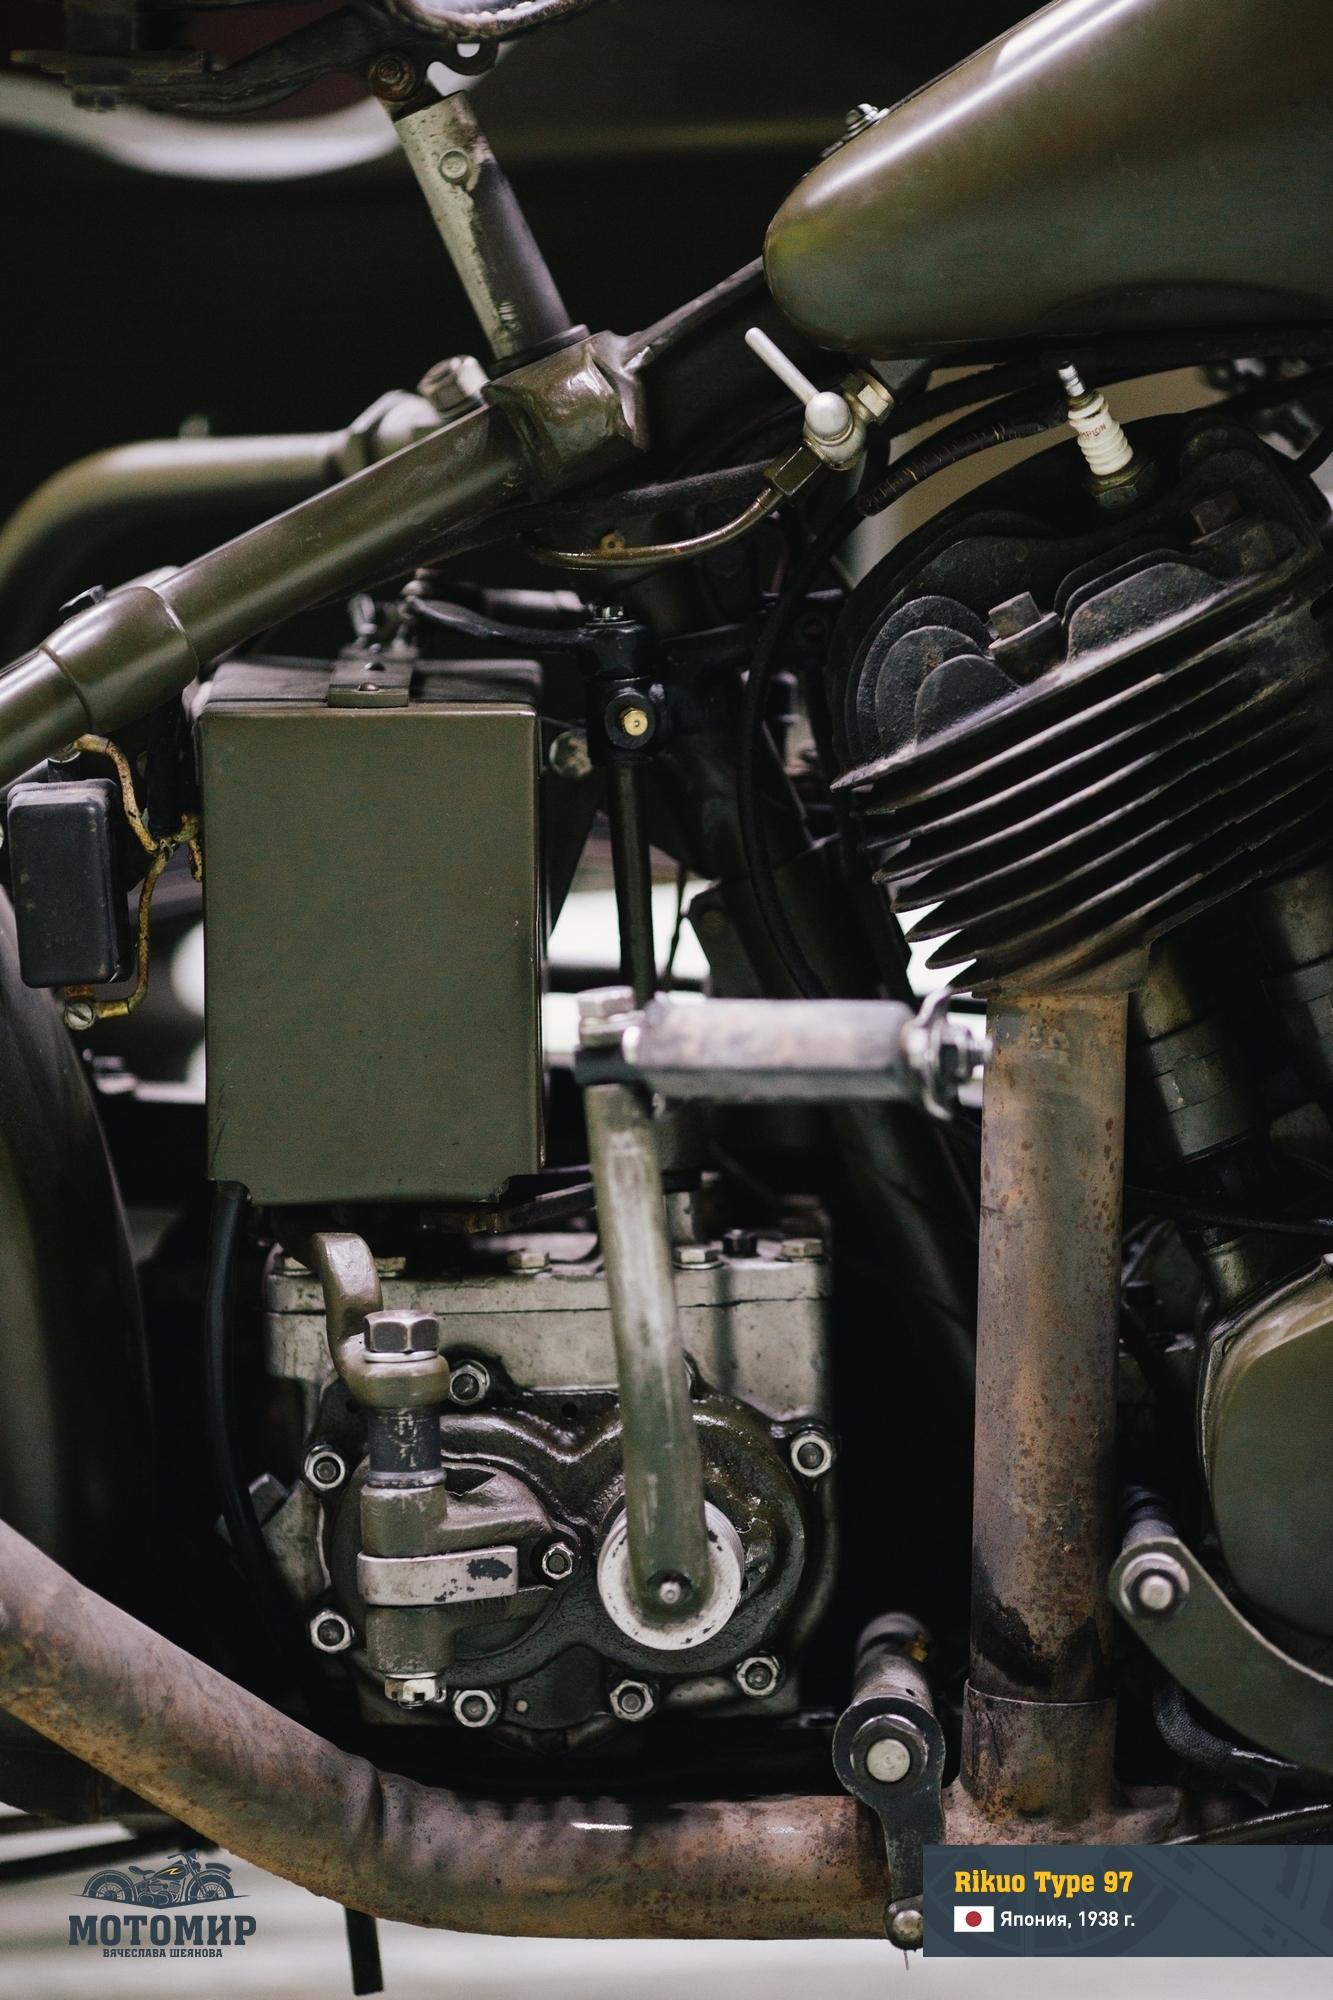 rikuo-type-97-1938-201502-web-16